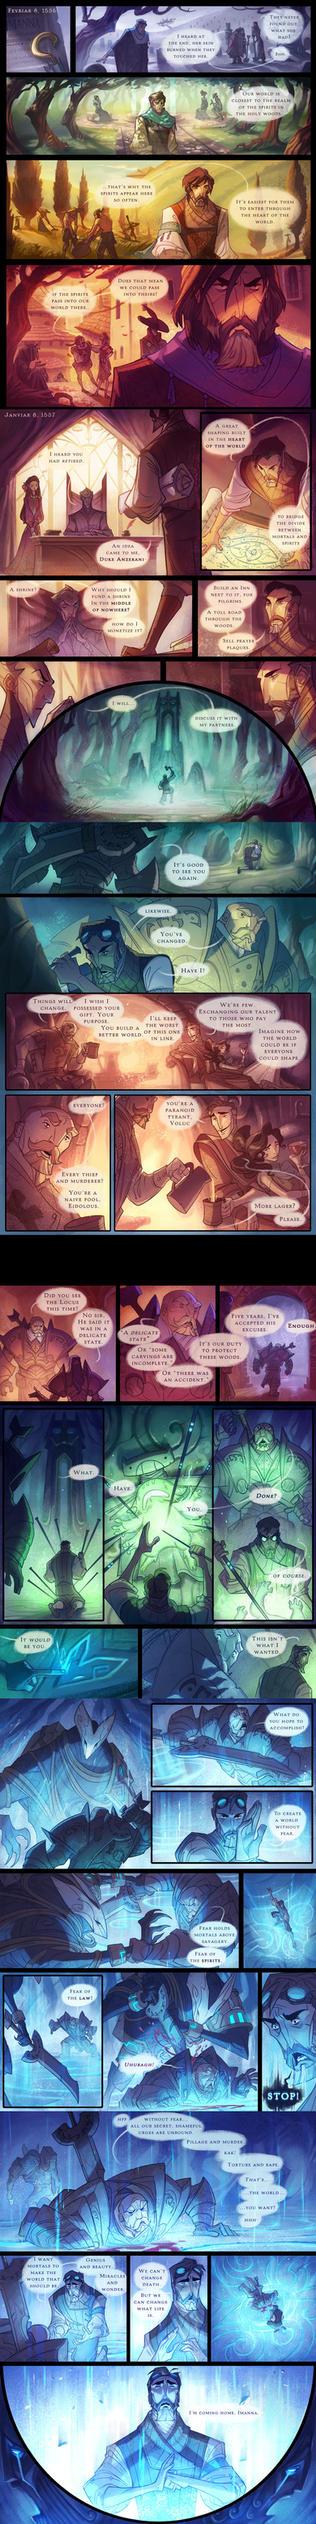 The Dawngate Chronicles - Prologue Part 2 by nicholaskole